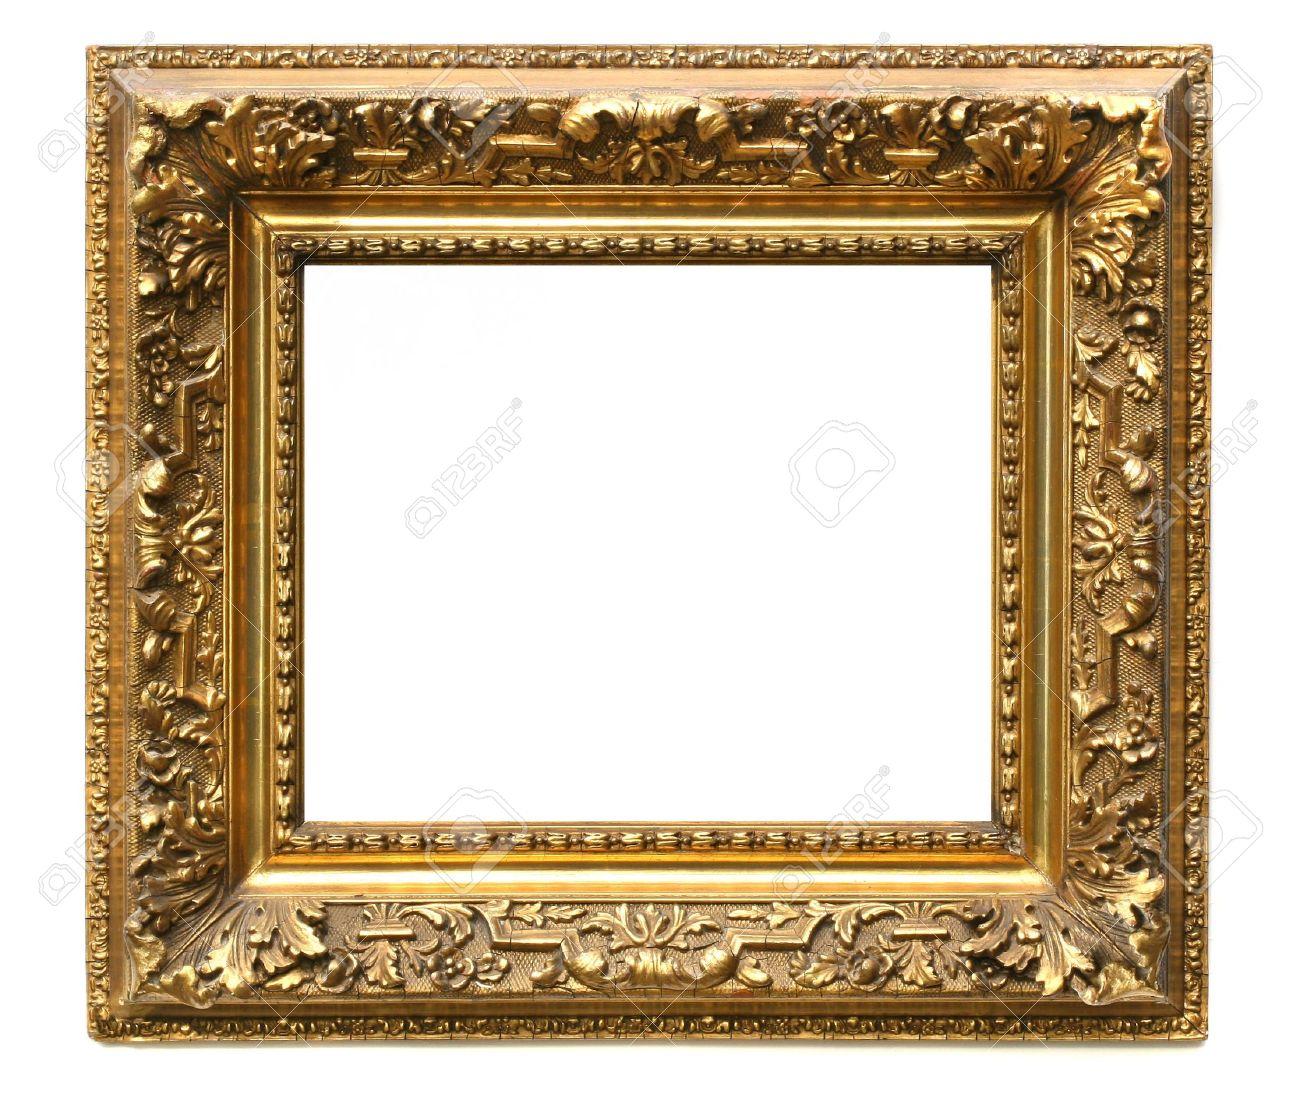 Old cracked gilded frame on white background Stock Photo - 3733936